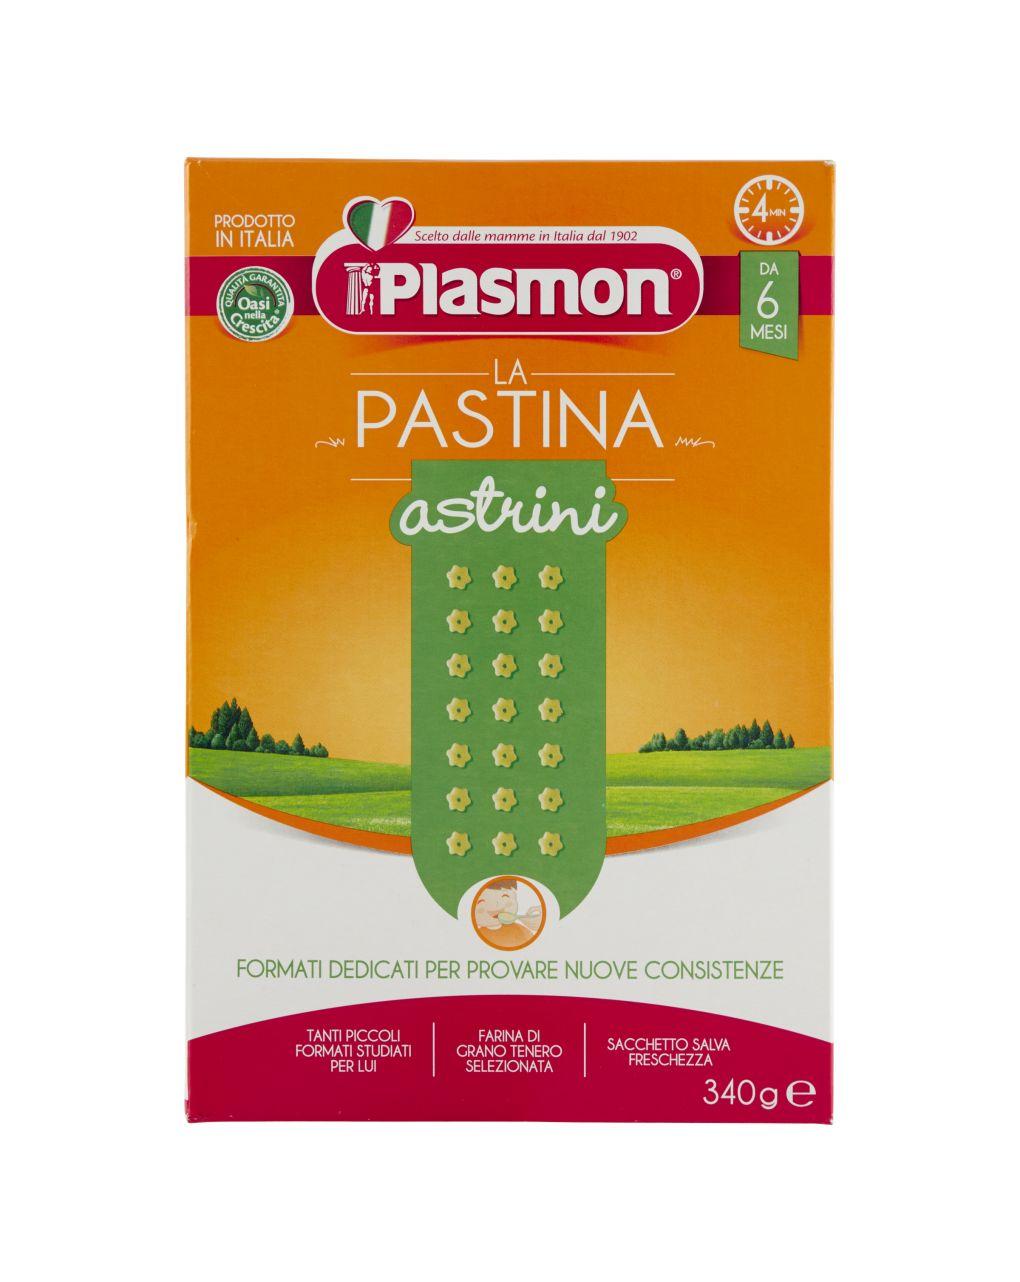 Plasmon - pastina astrini 340g - Plasmon